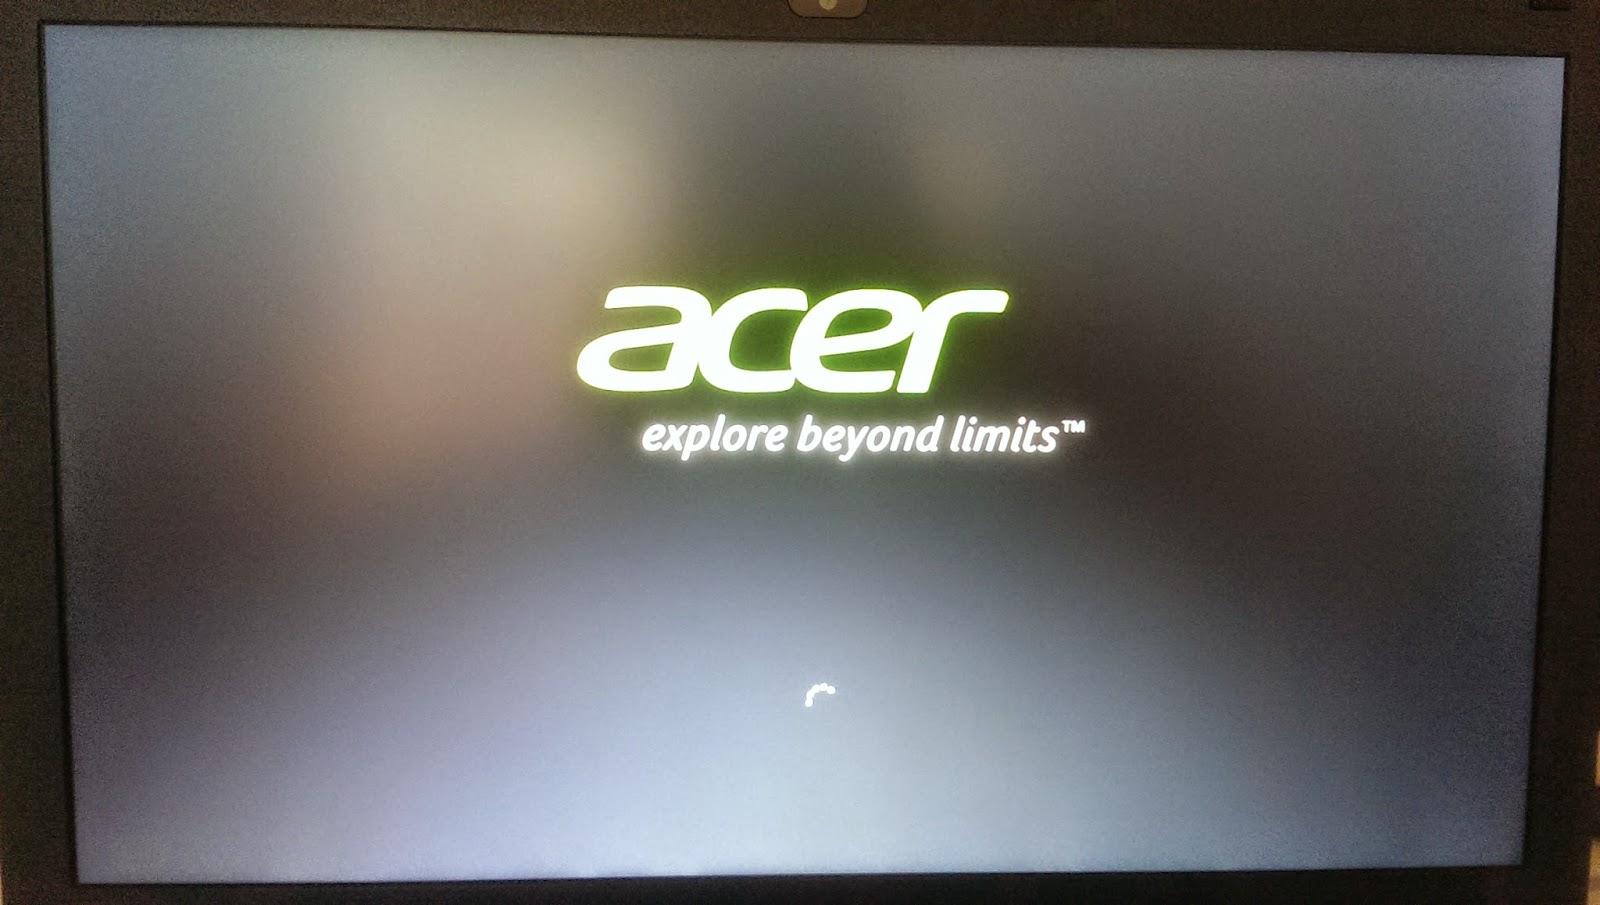 2015 03 22%2B12.22.25 - [開箱] Acer E5-572G i5-4210M 搭配NVIDIA 840G 2G獨顯